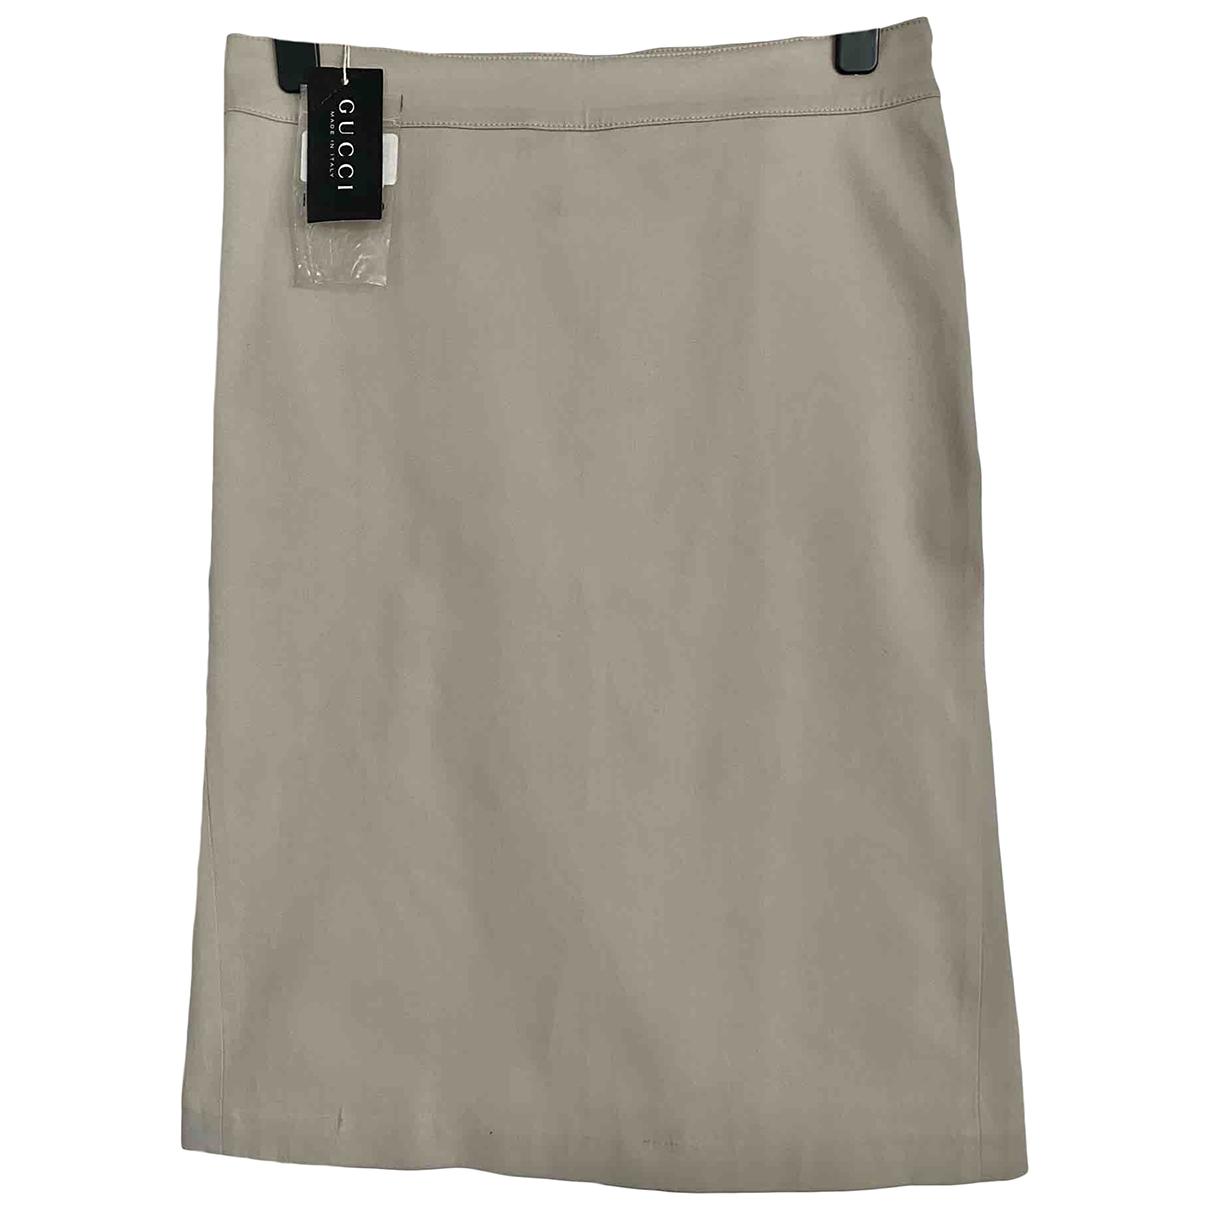 Gucci \N Beige Cotton skirt for Women 44 IT